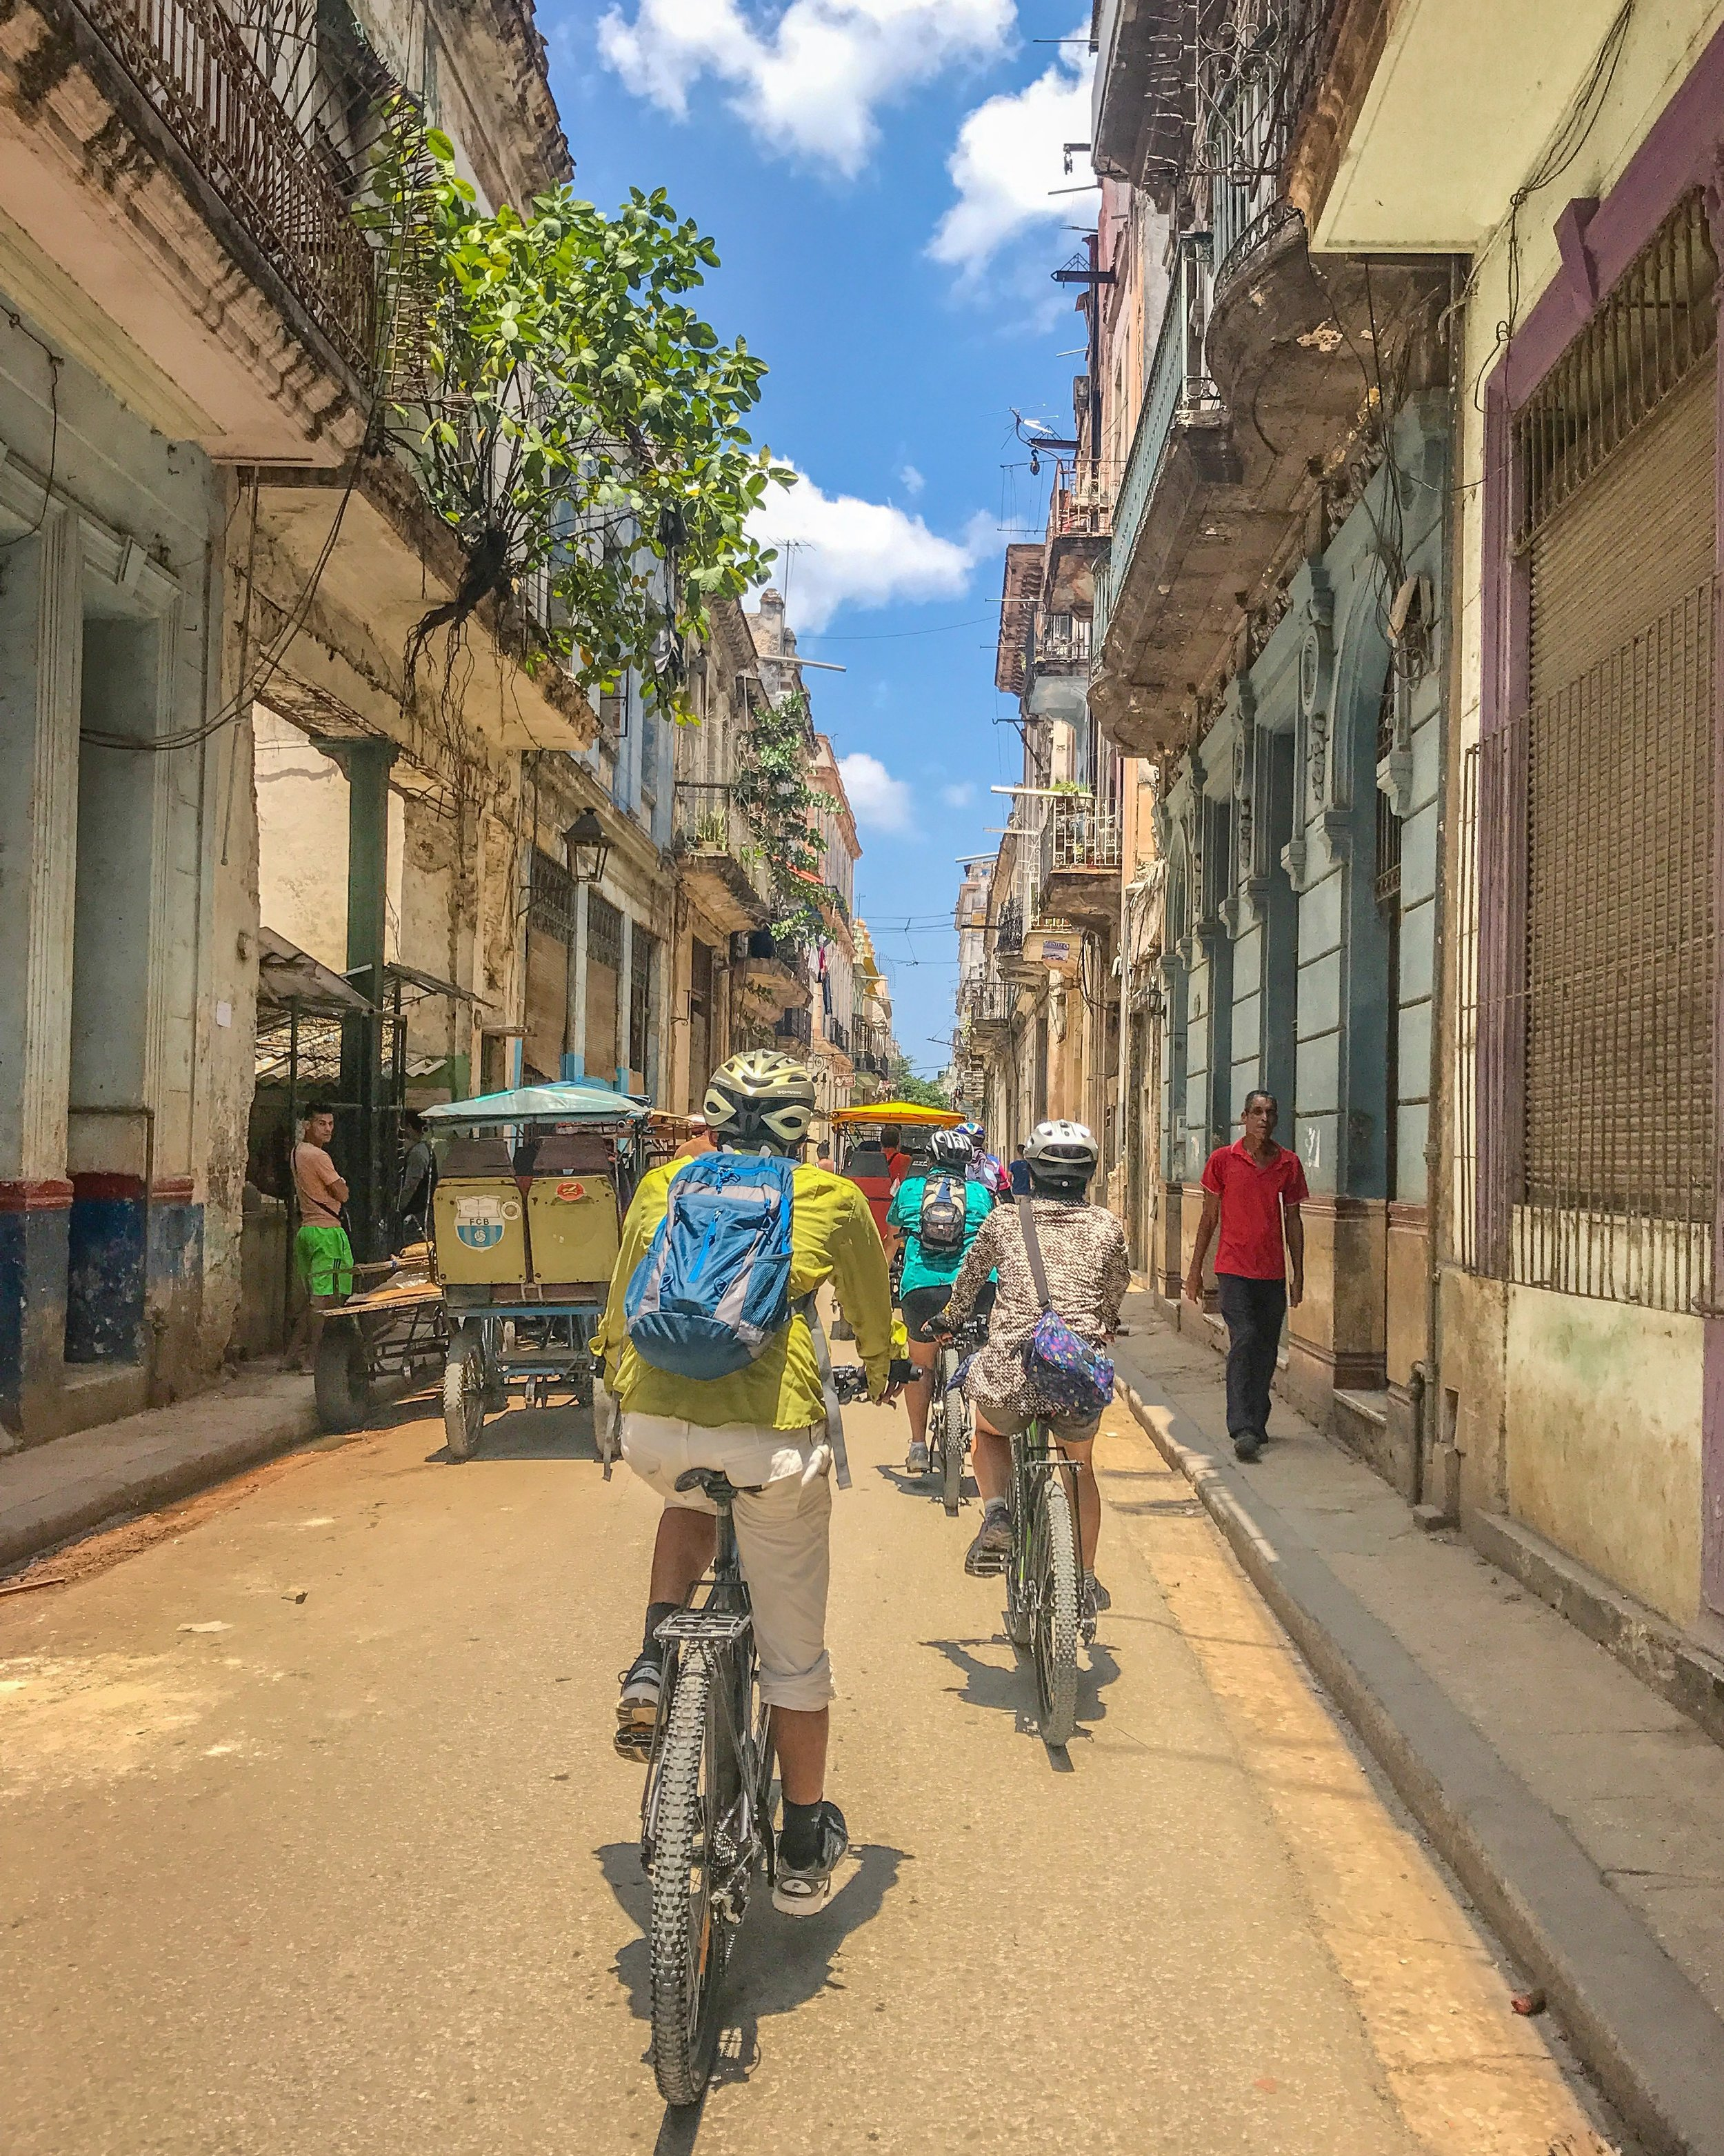 Bike ride through Old Havana